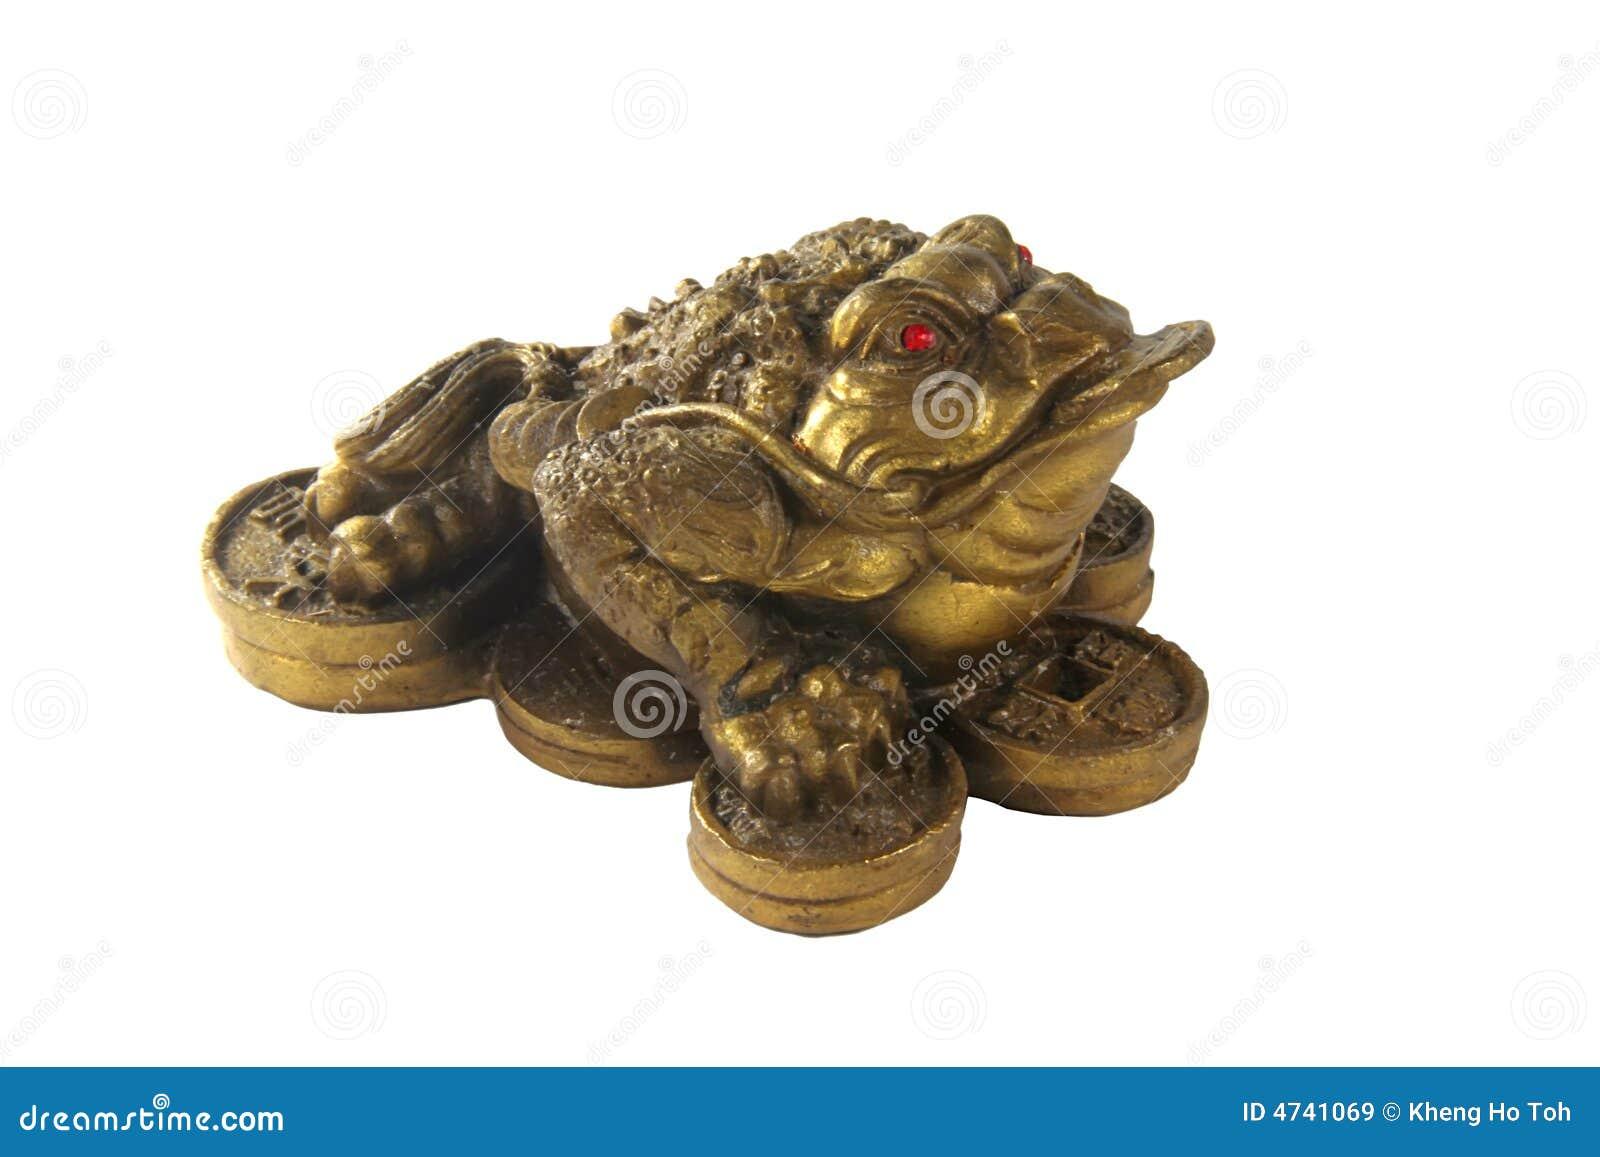 money frog feng shui item for business wealth stock image image of culture chinese 4741069. Black Bedroom Furniture Sets. Home Design Ideas